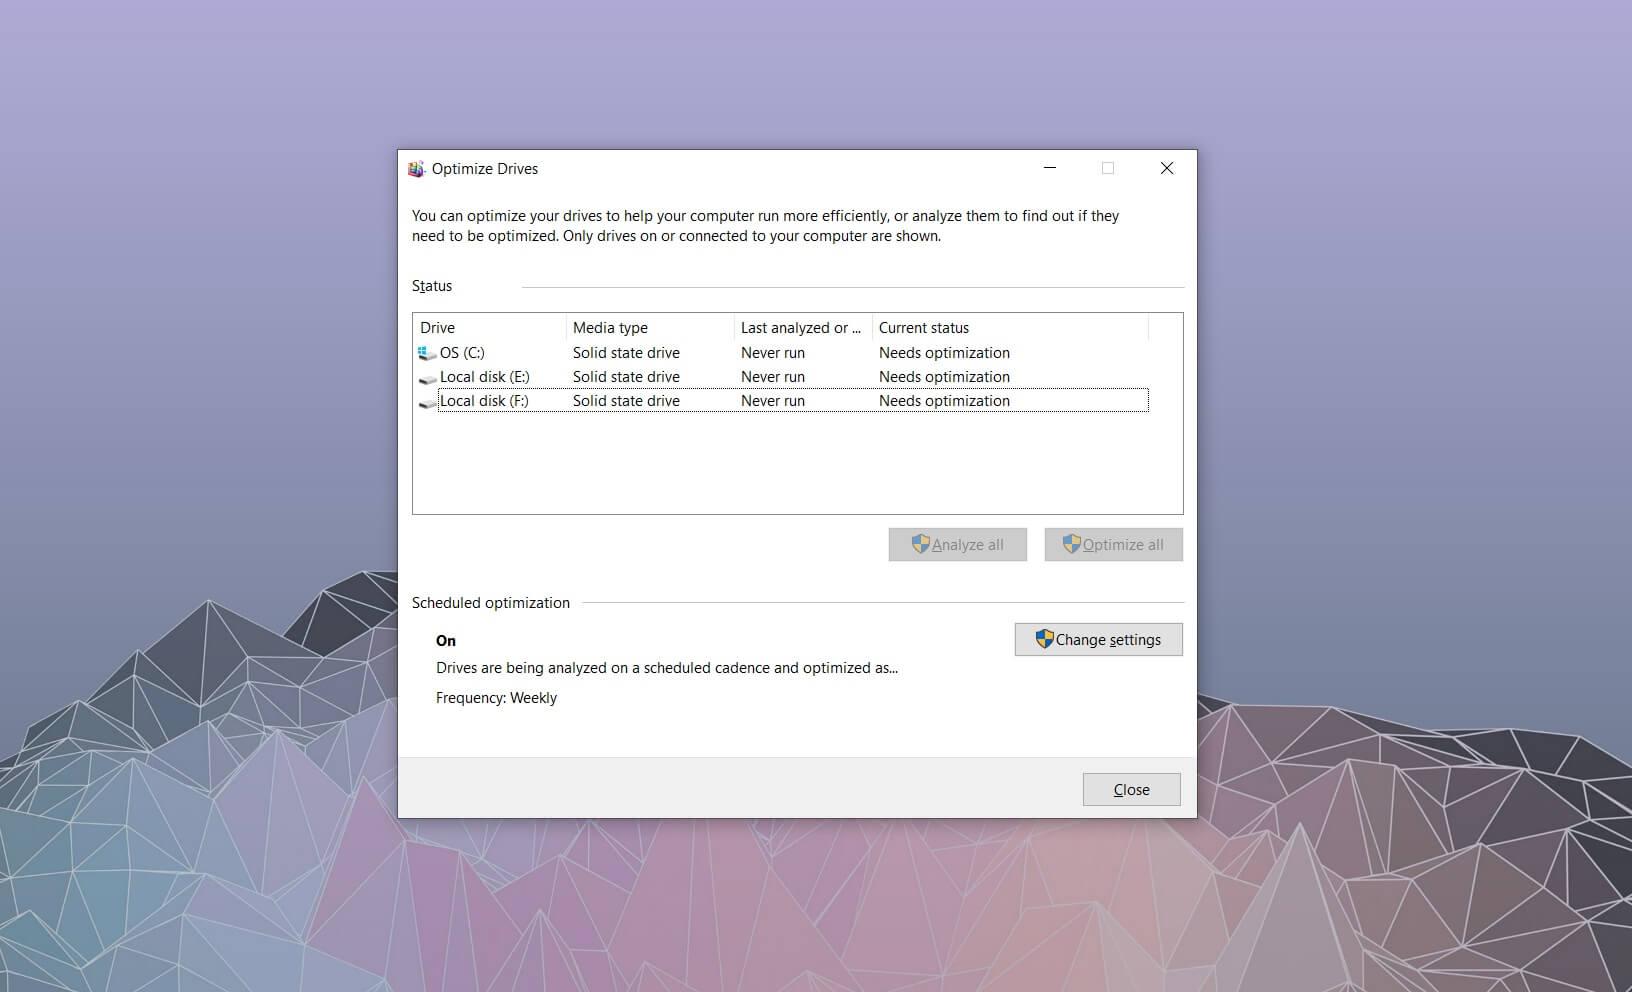 Windows 10 Optimize Drives